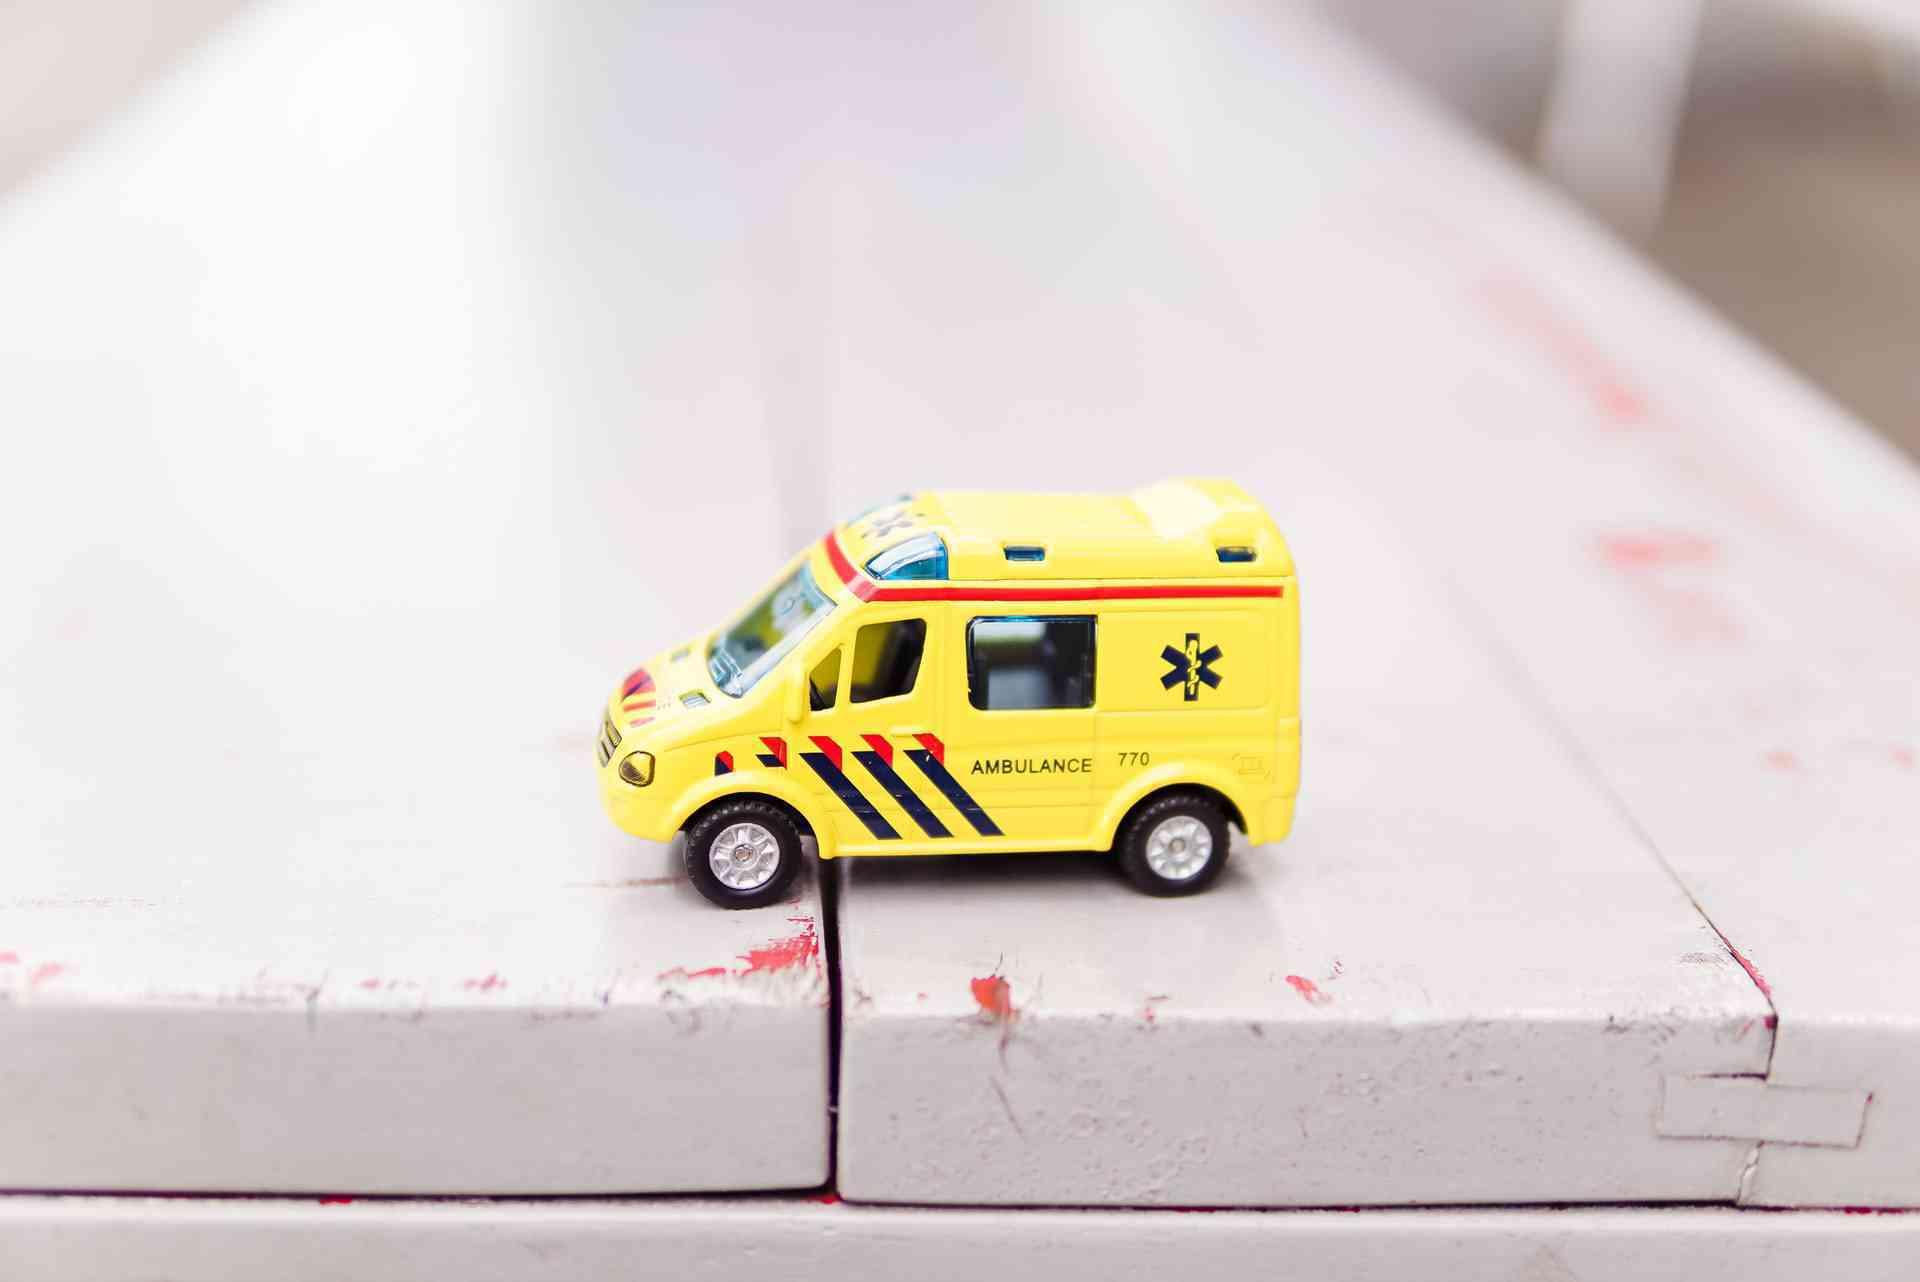 UofA: to establish First Paramedic and Emergency Medicine Center